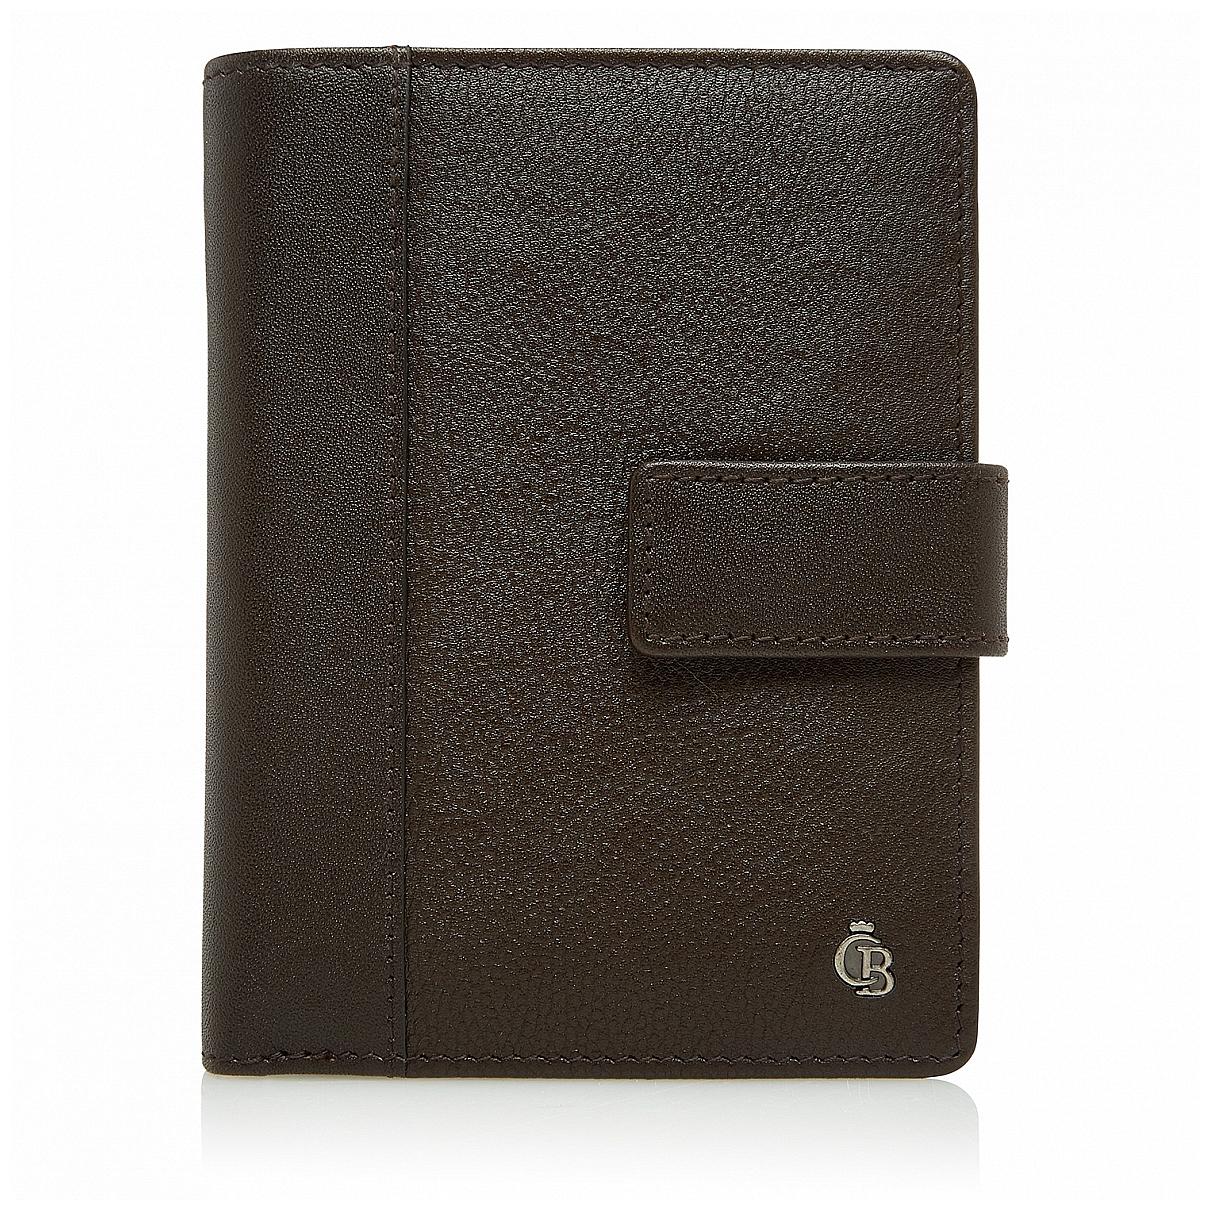 Castelijn & Beerens Pánská kožená peněženka RFID 695415 hnědá